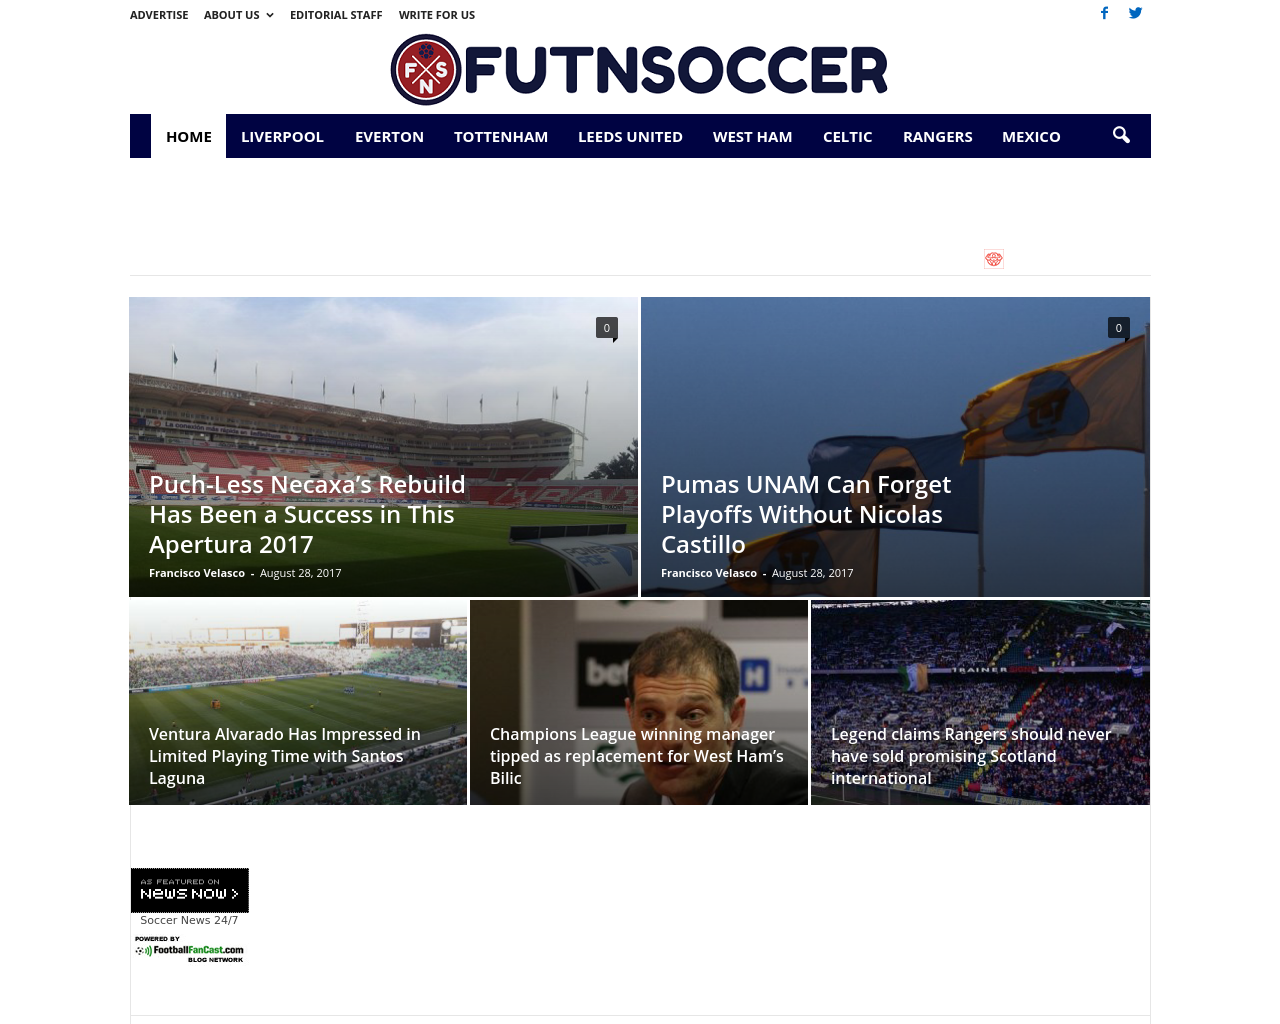 FutnSoccer-Advertising-Reviews-Pricing